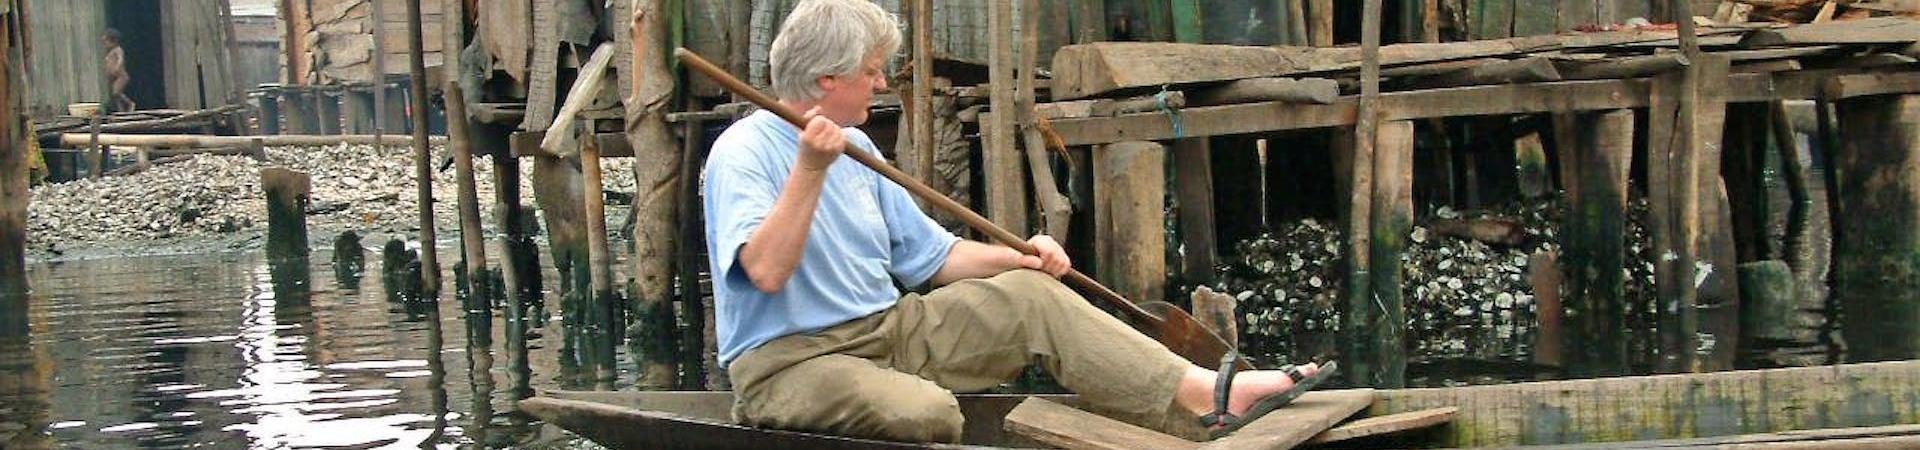 Lars Soeftestad, paddling boat in Nigeria